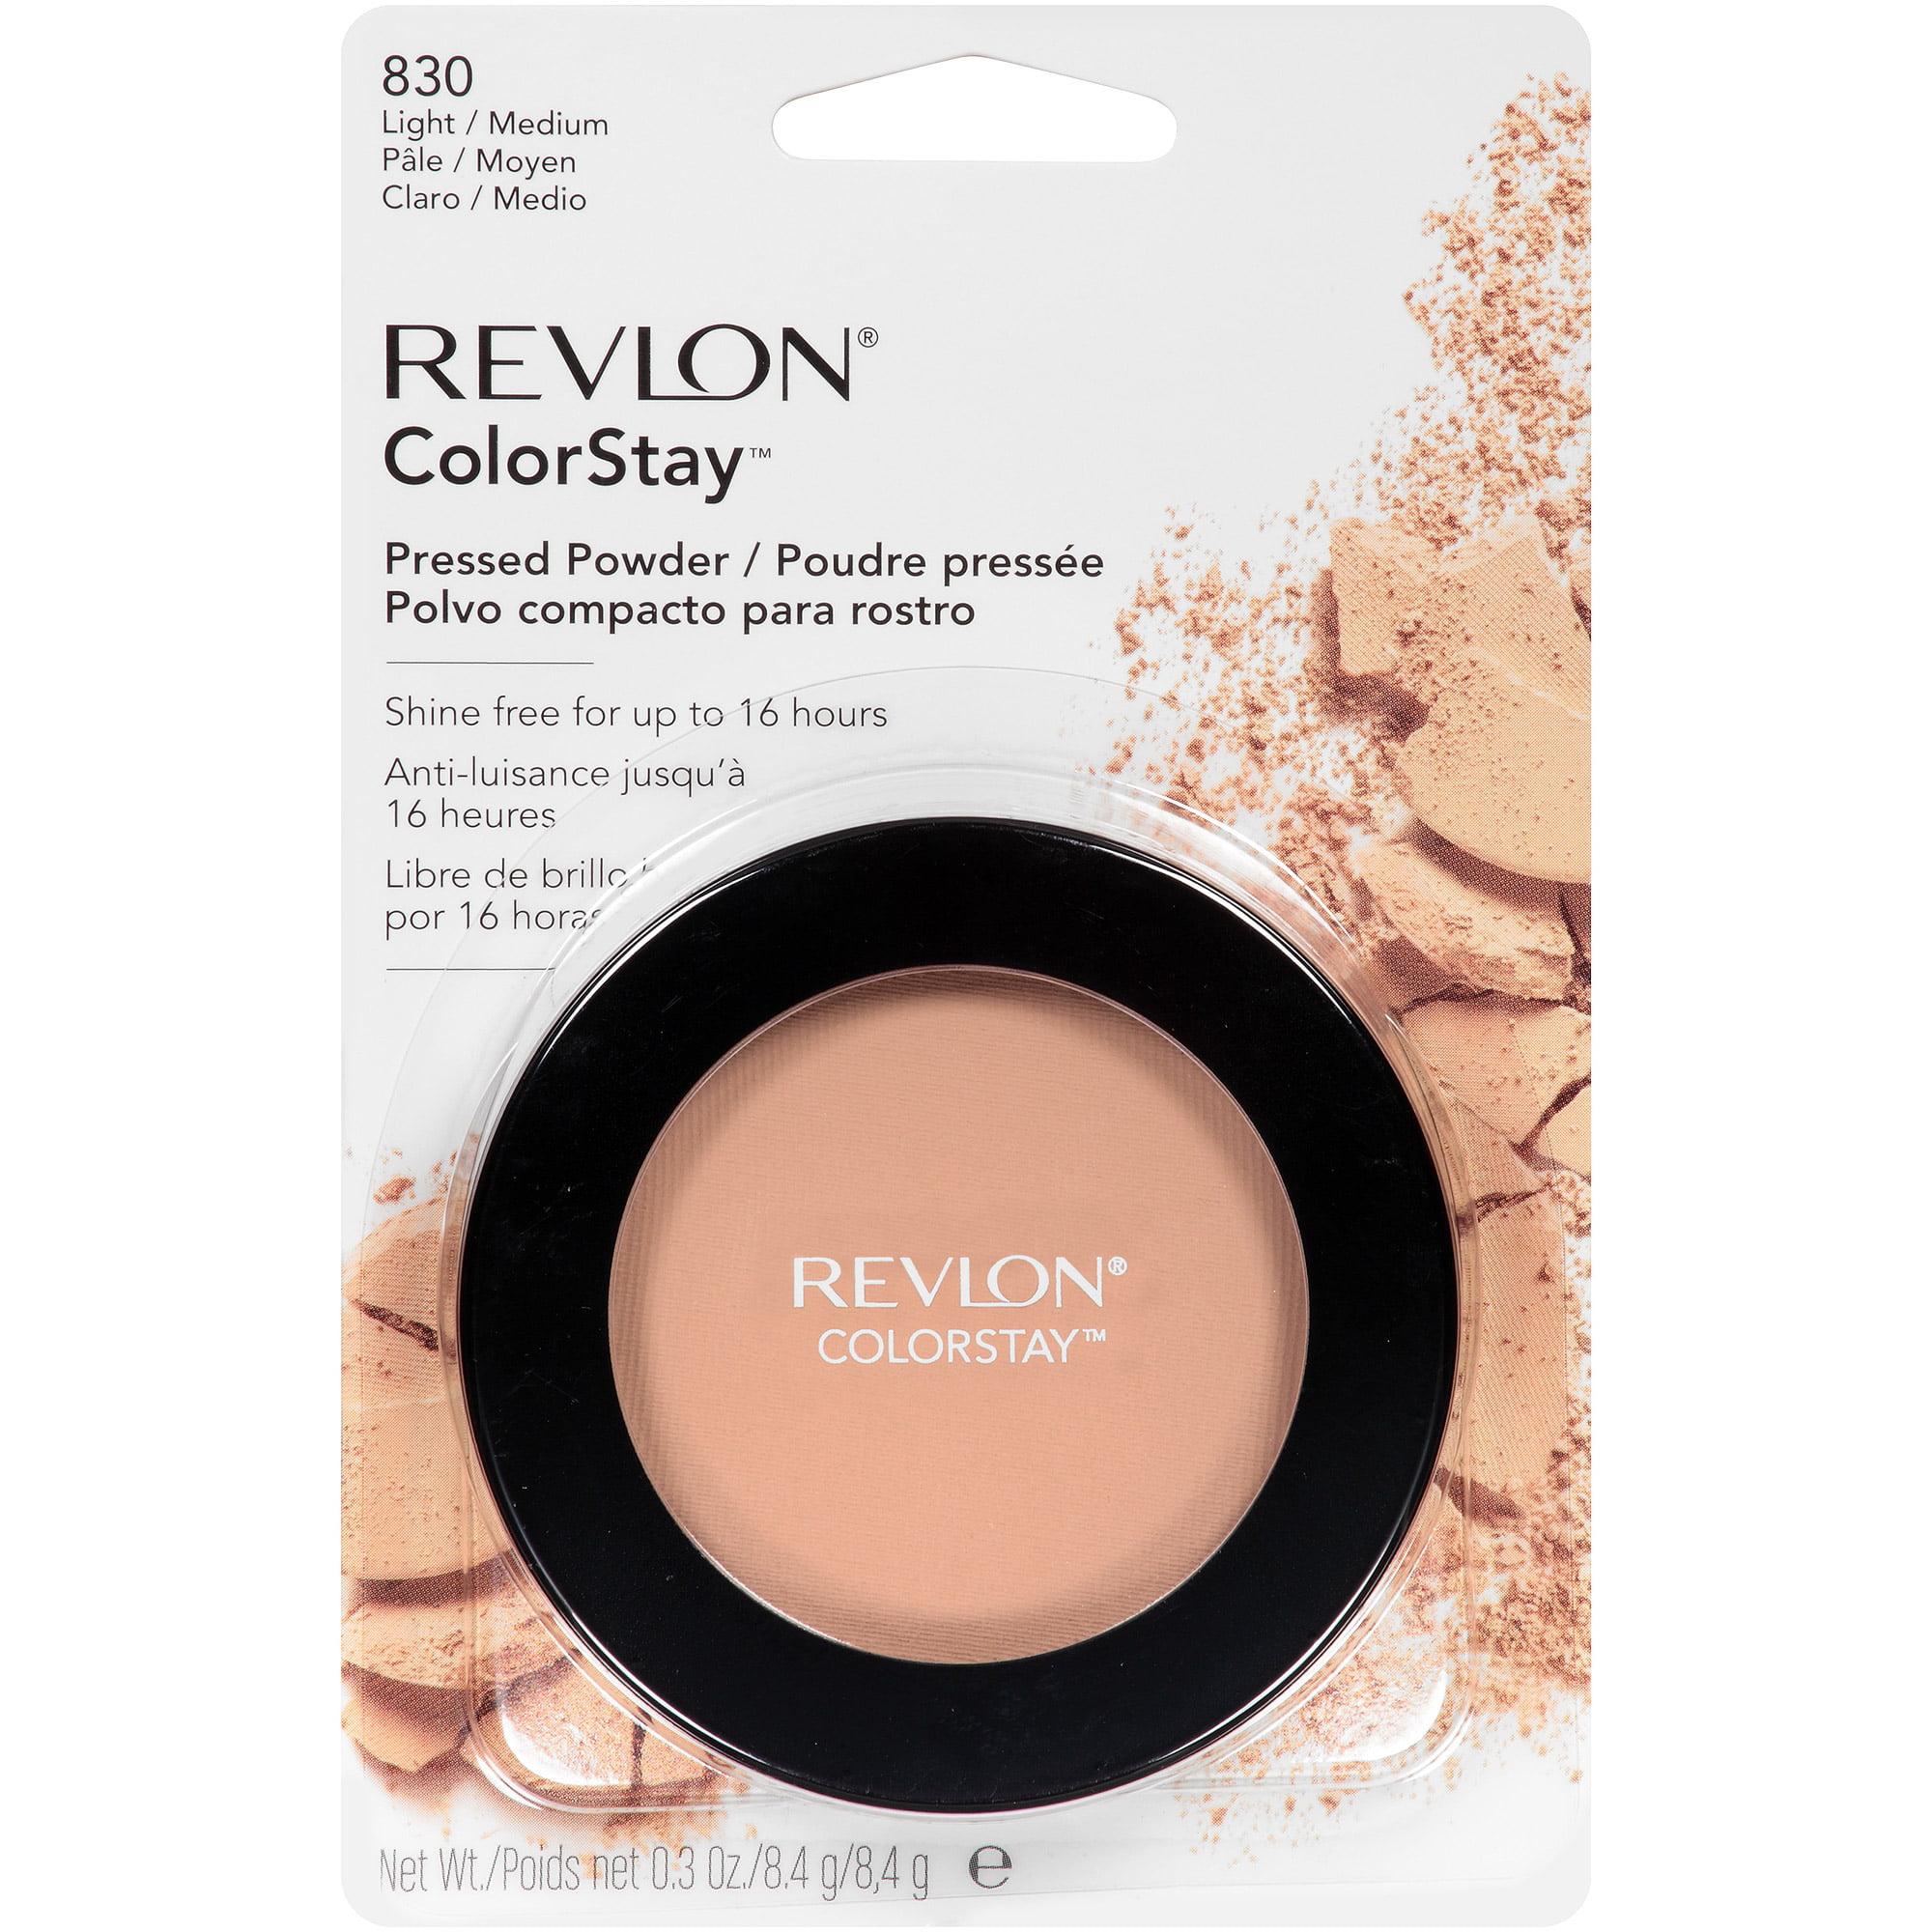 Revlon ColorStay Pressed Powder, 830 Light/Medium, 0.3 oz